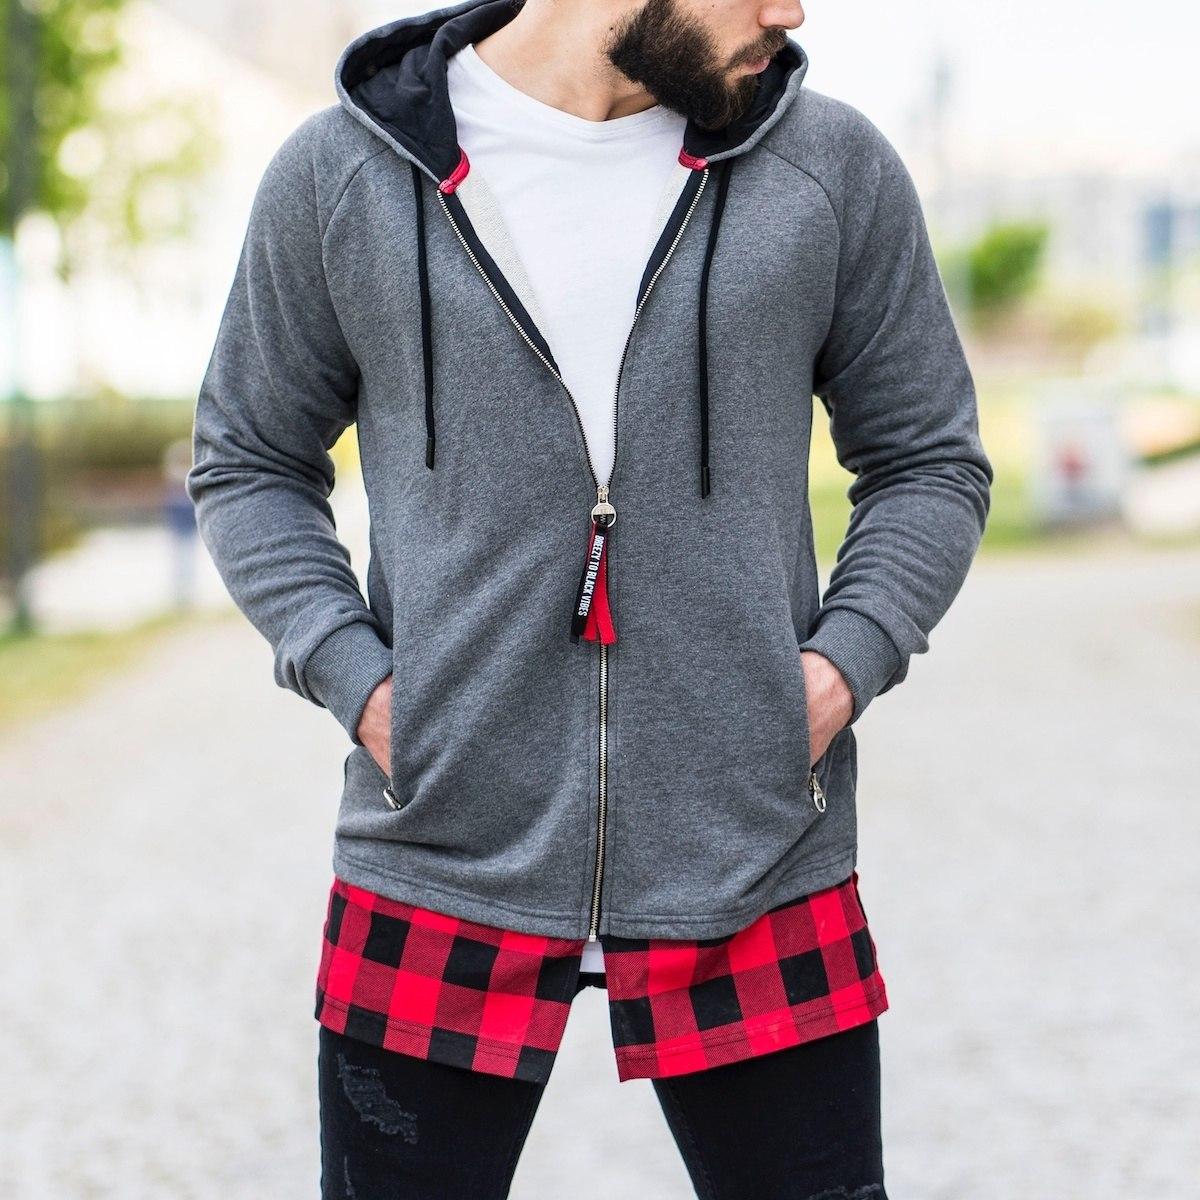 Red&Black Plaid Style Gray Hoodie